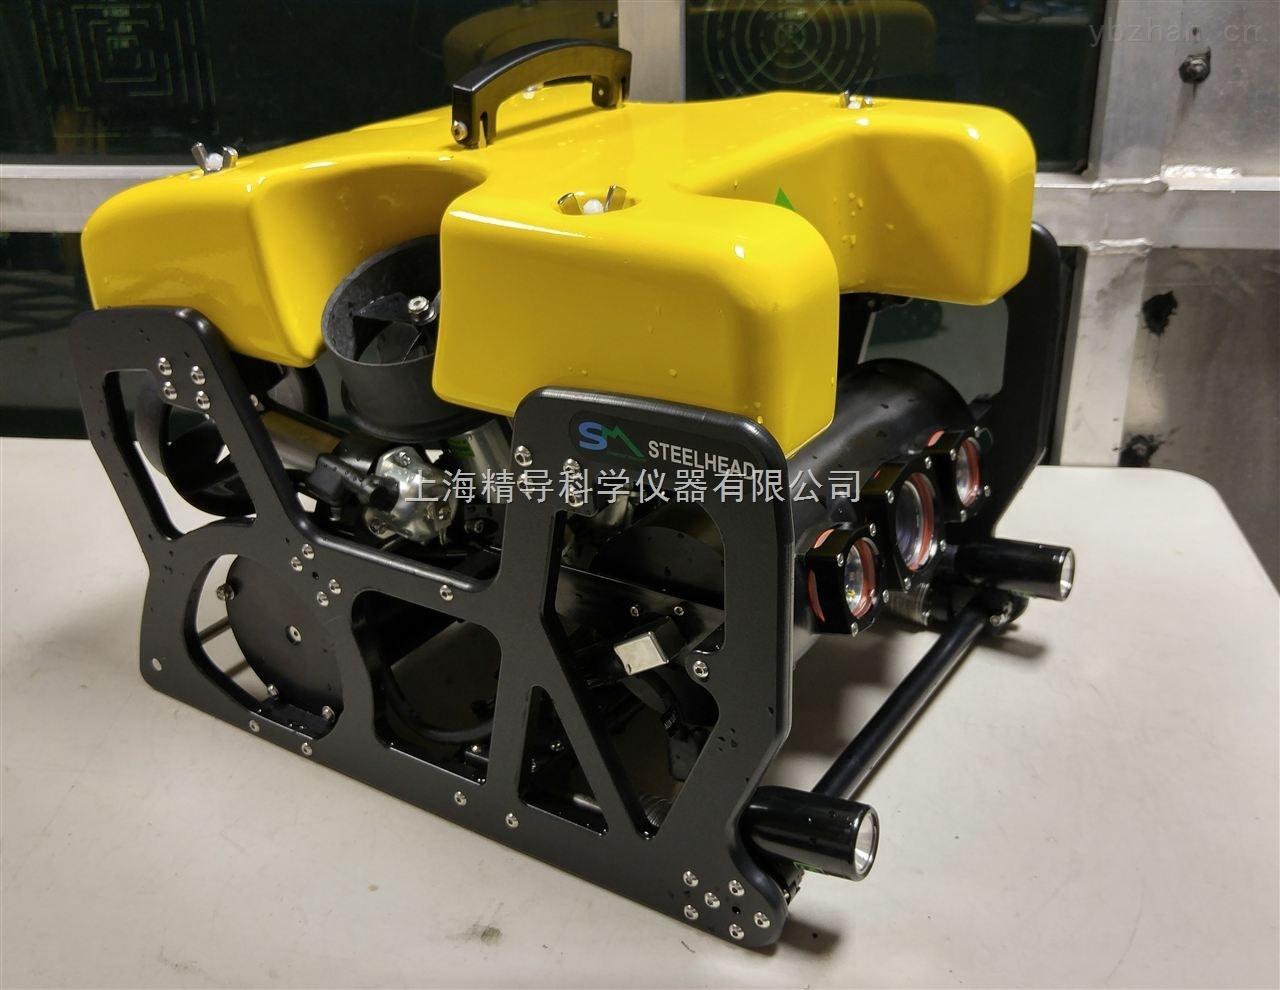 Seamor ROV 水下机器人(Chinook-ROV及Steelhead ROV)